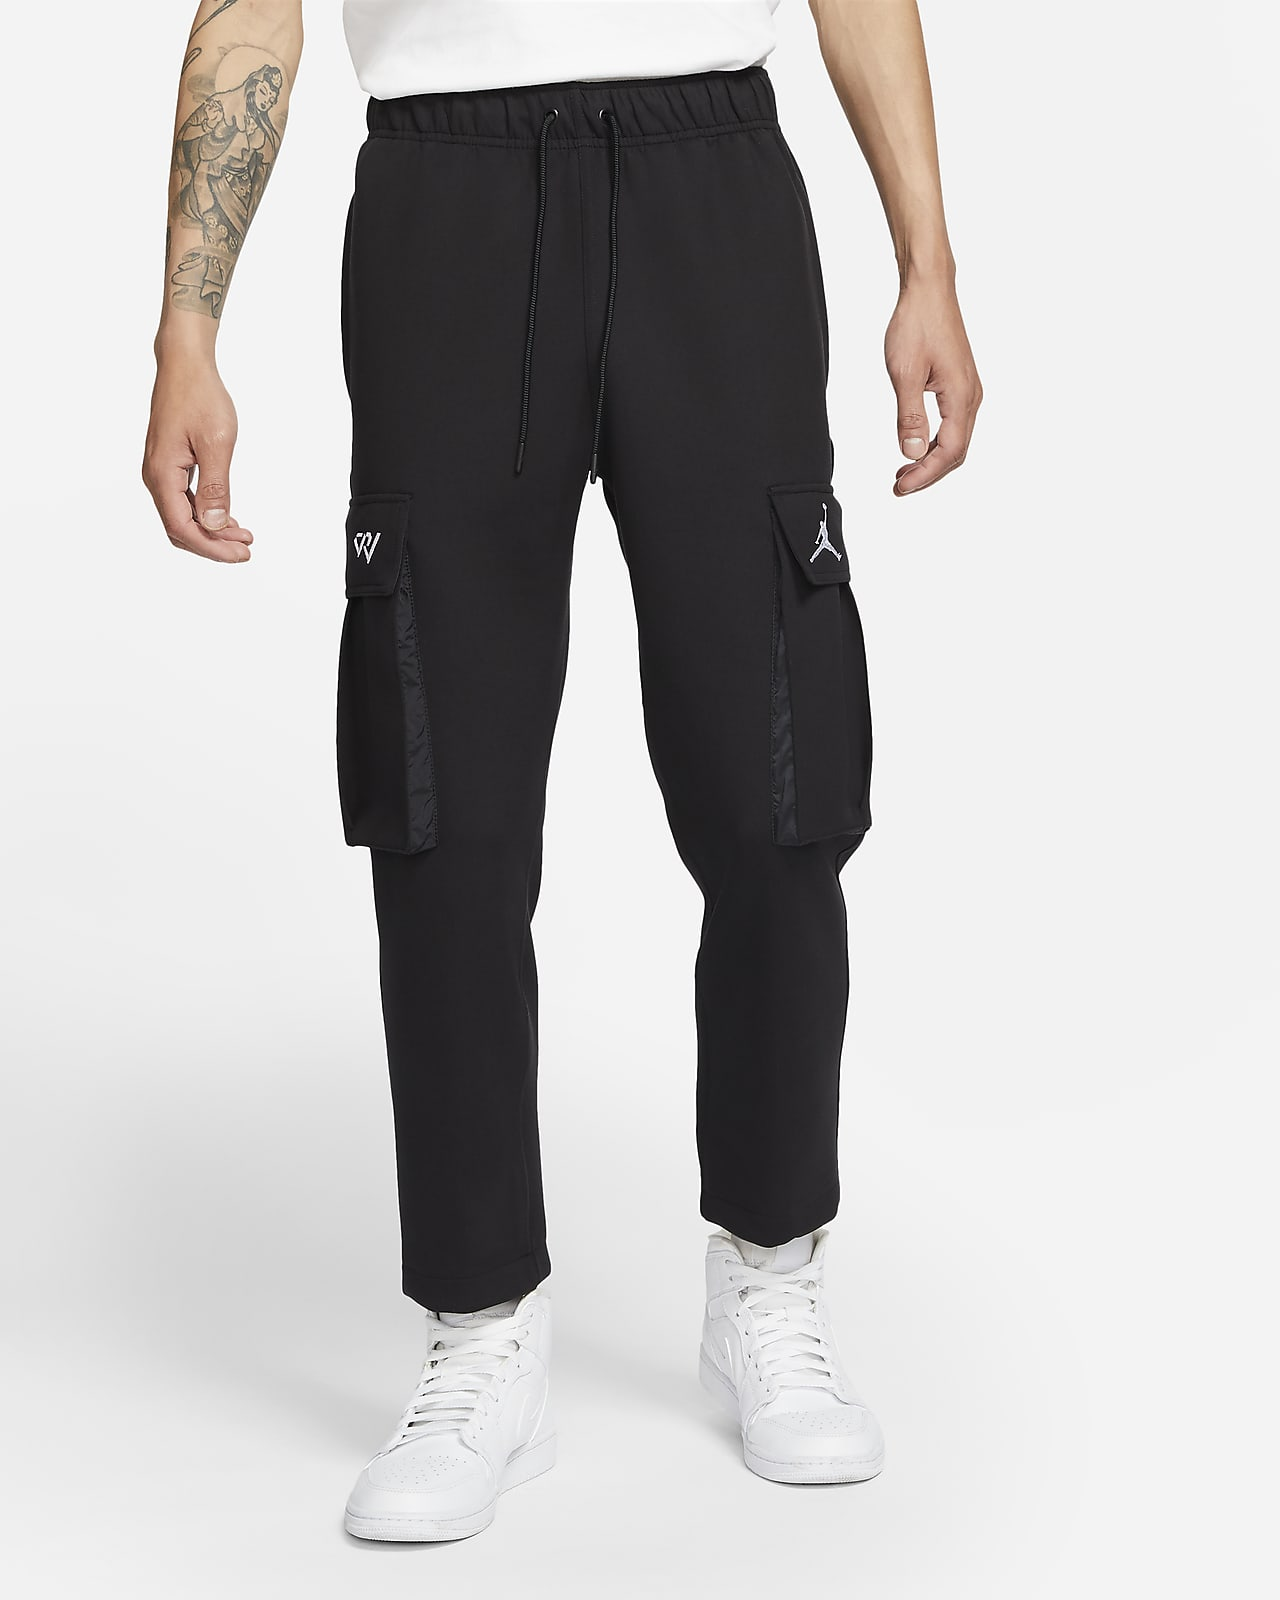 Jordan Why Not 男子针织工装长裤